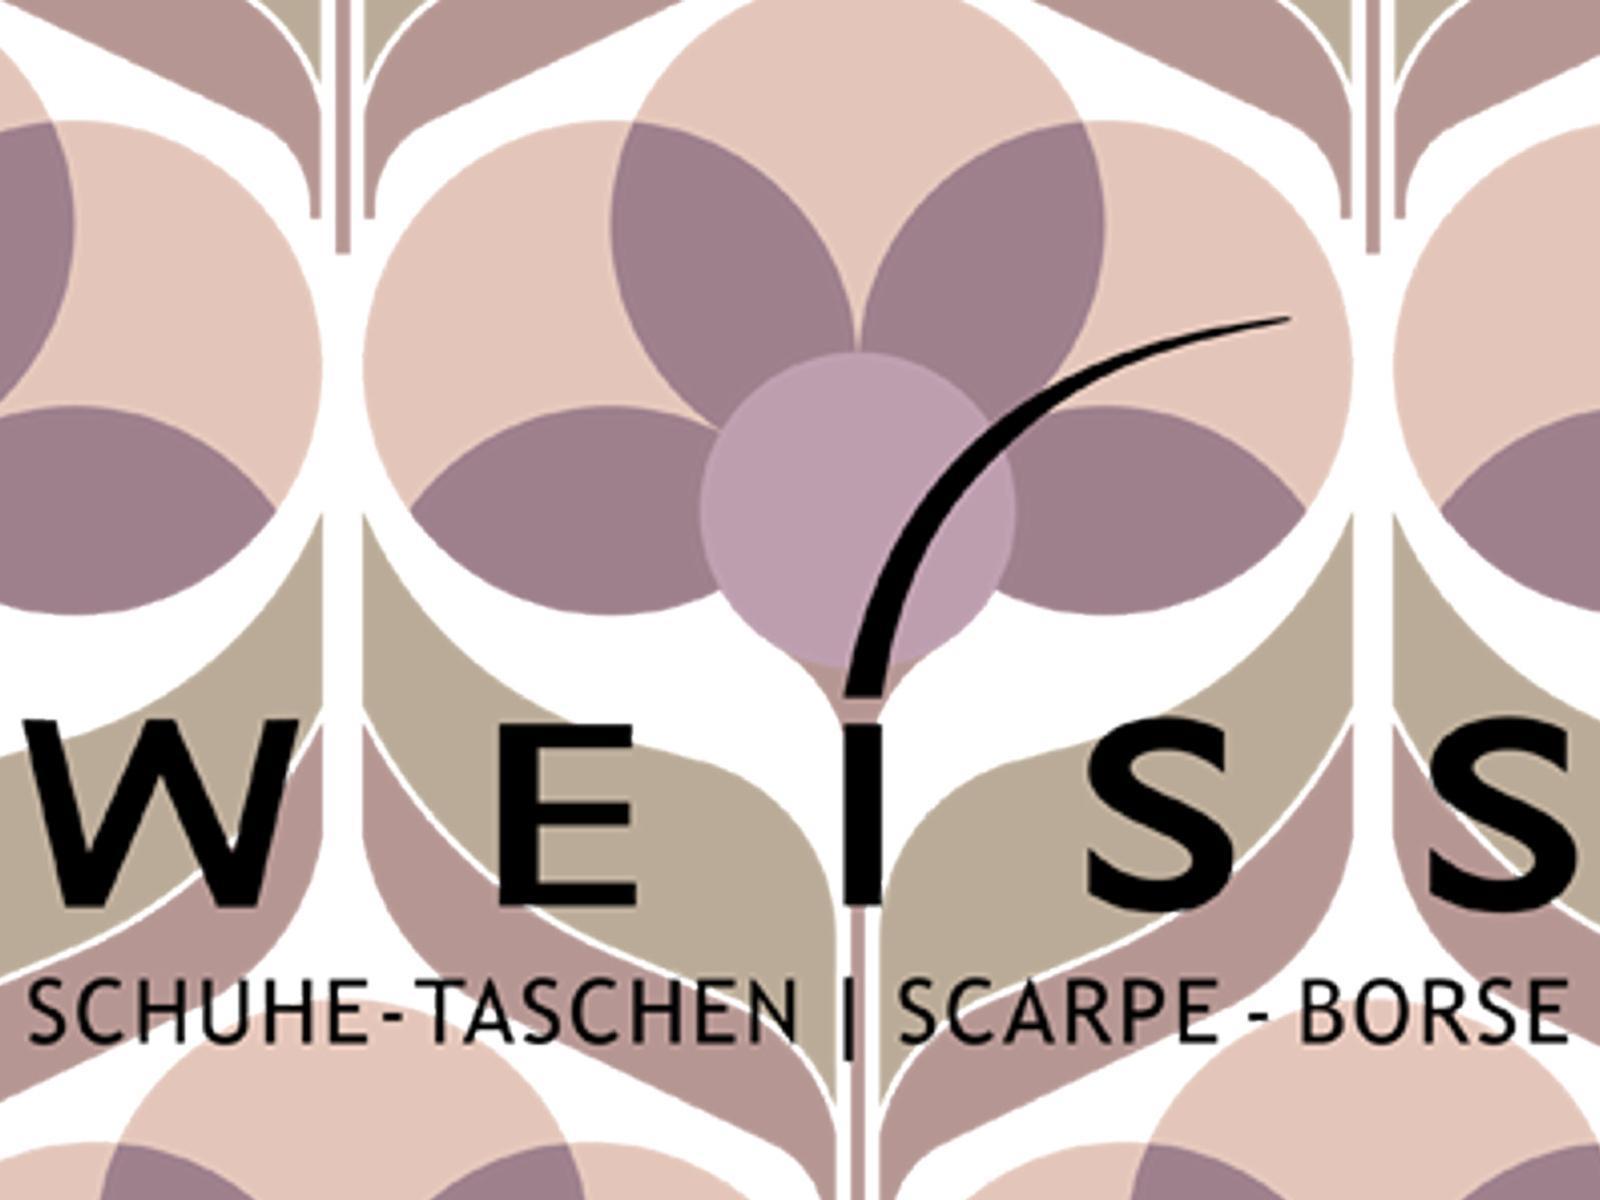 Schuhe & Handtaschen Weiss Hannes & Co. KG